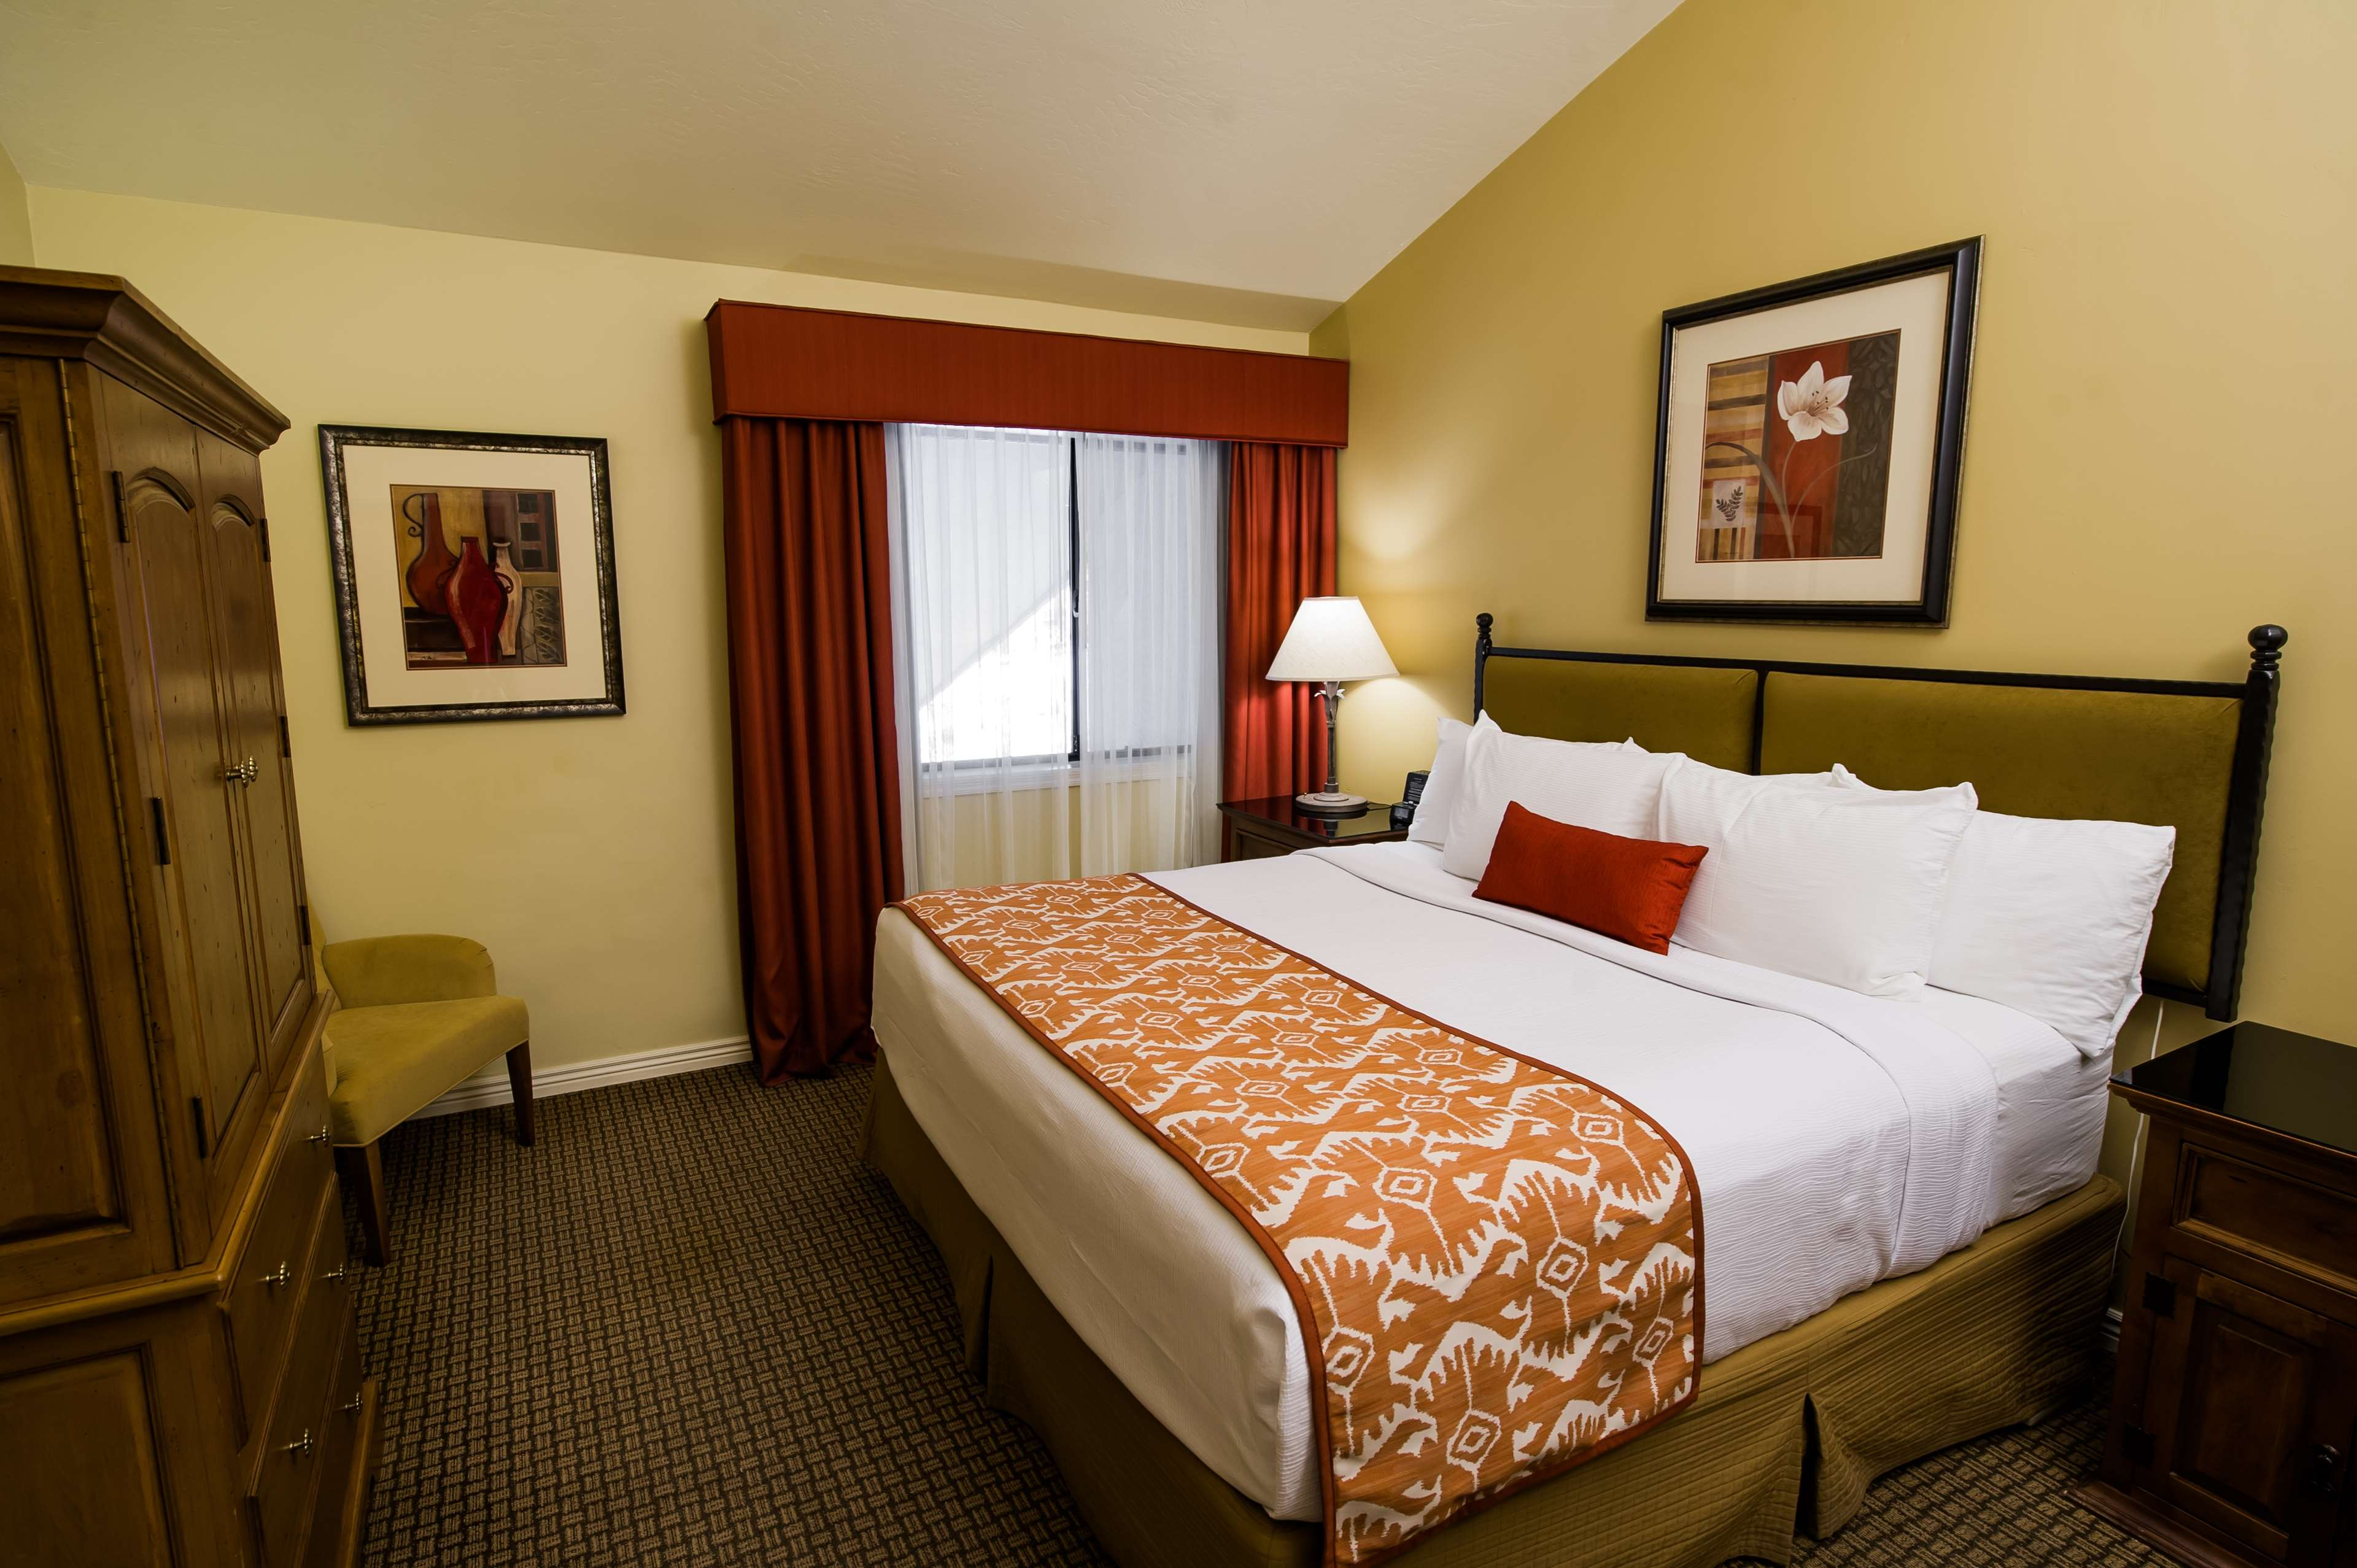 Best Western Plus Arroyo Roble Hotel & Creekside Villas image 40